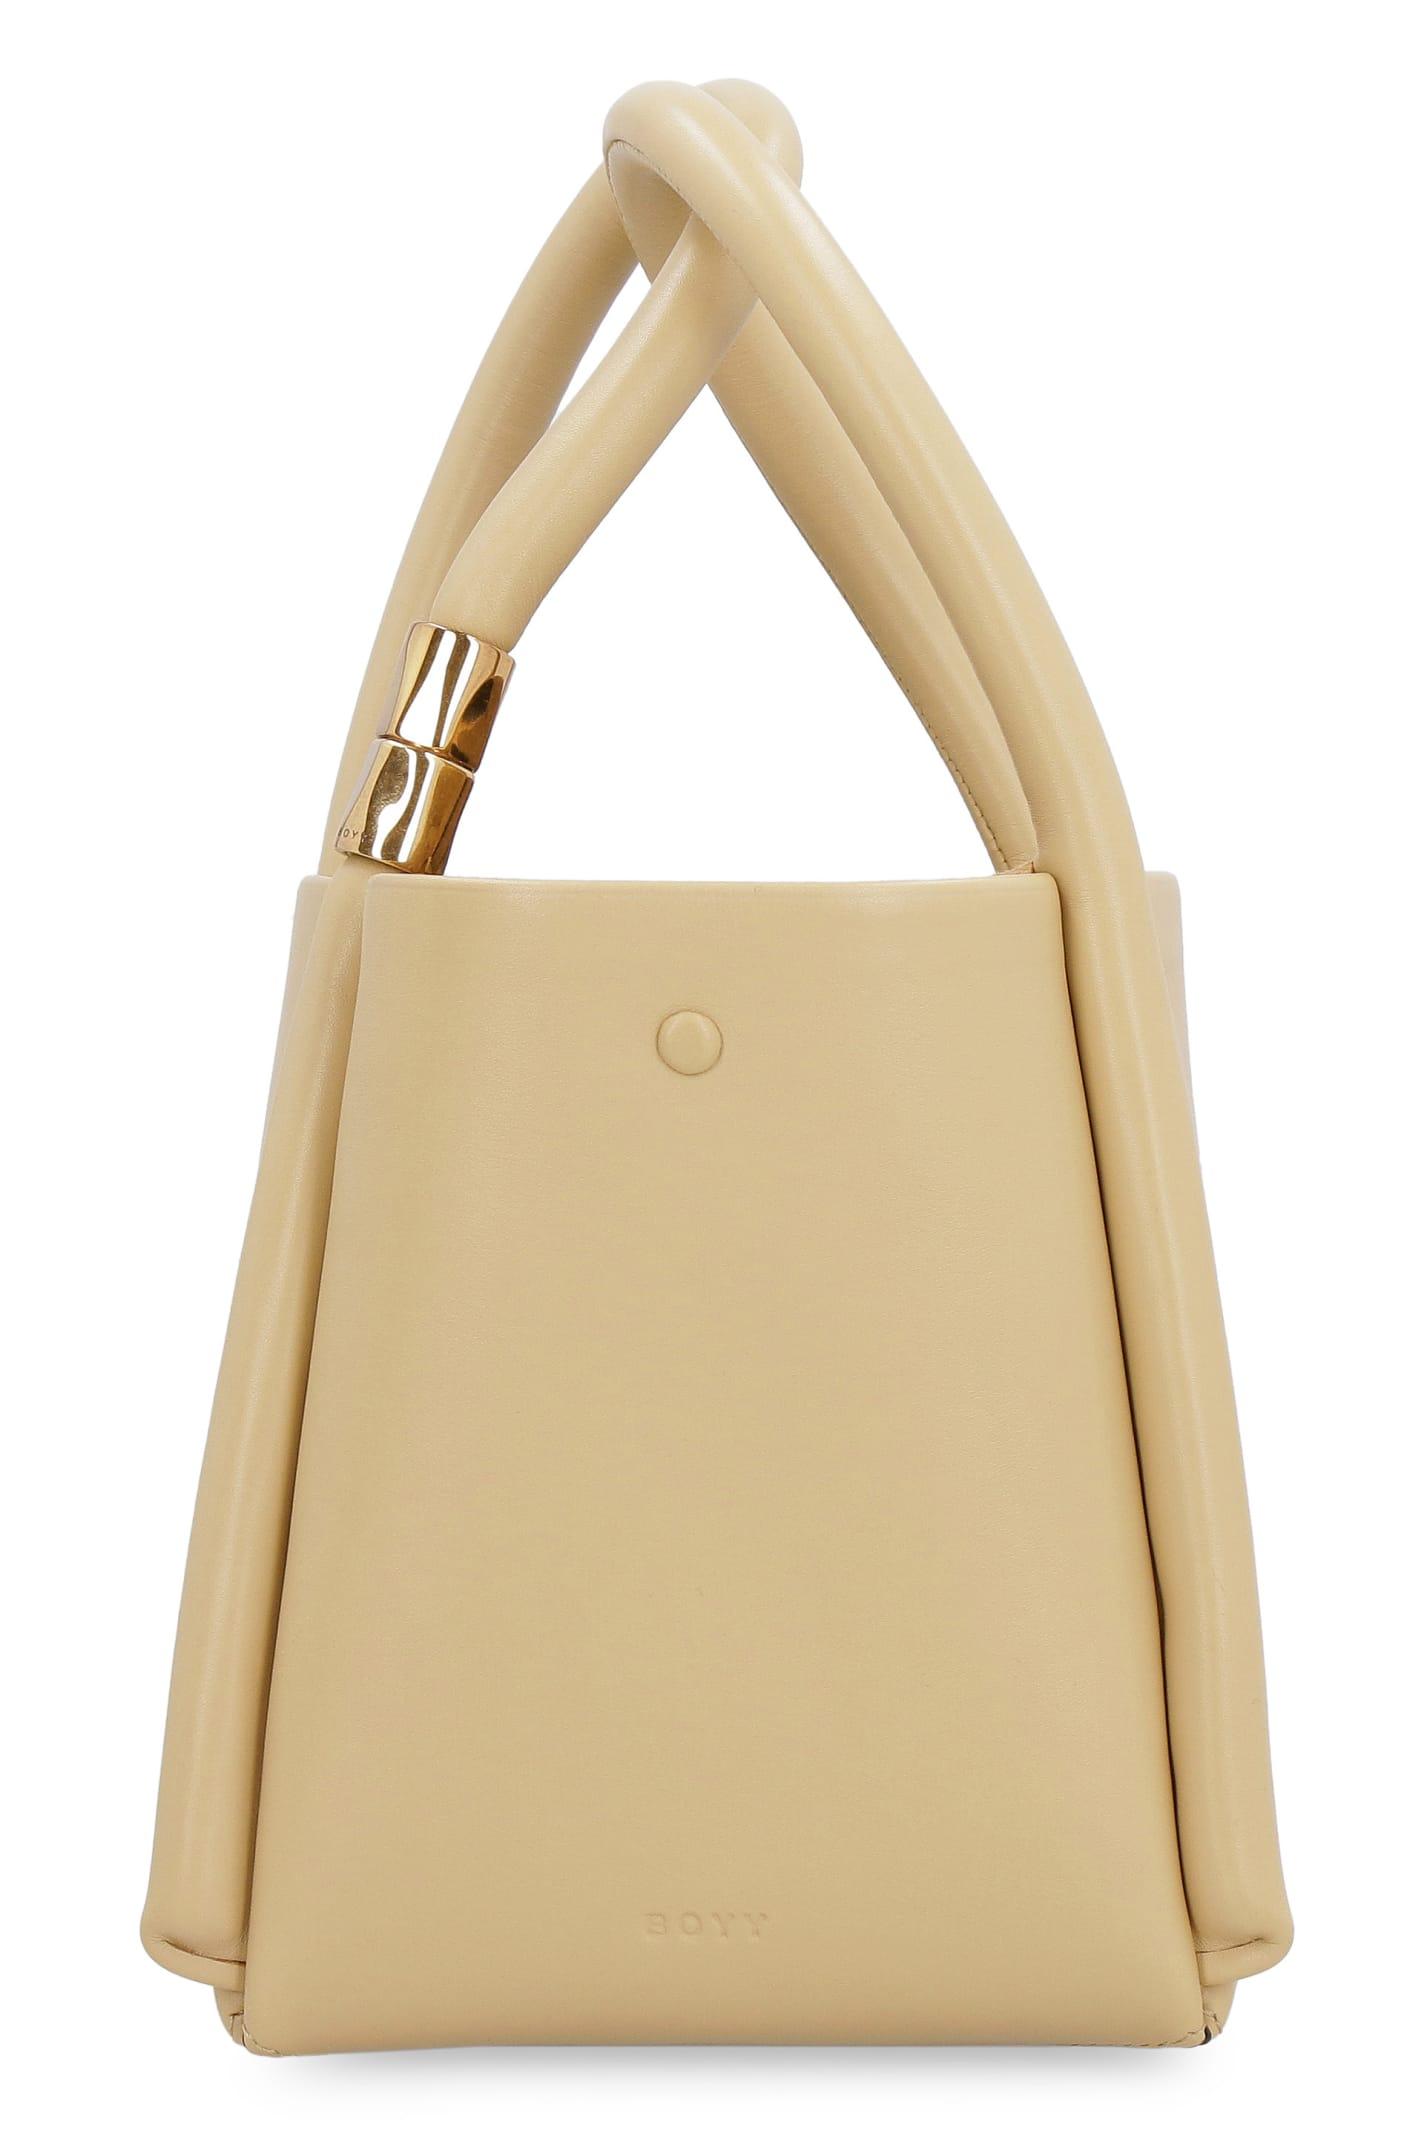 Lotus 12 Leather Mini Bag